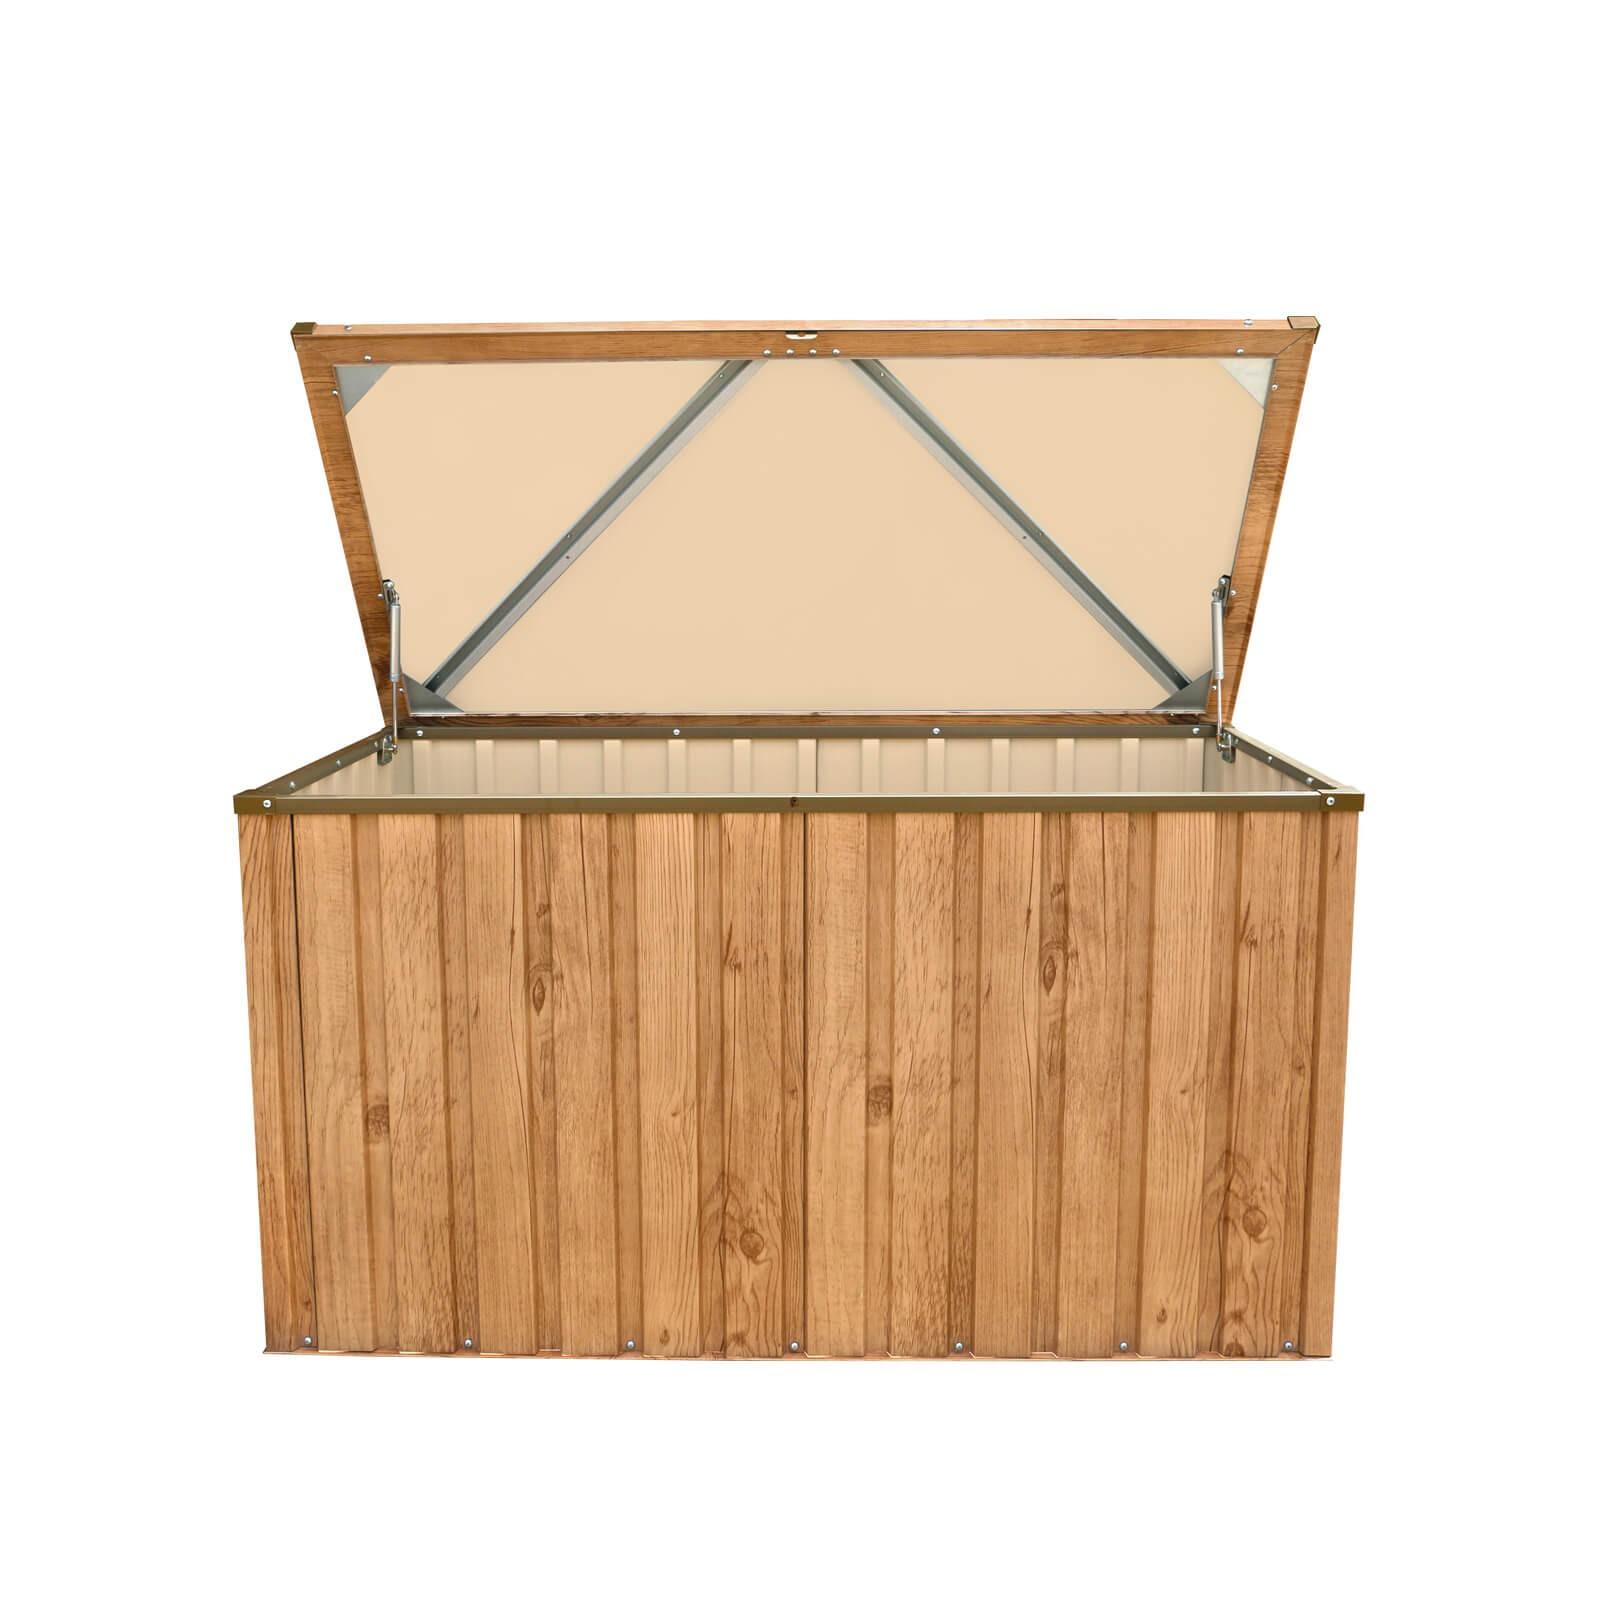 metall aufbewahrungsbox gartenbox kissenbox ger tebox 135x70 cm holz dekor eiche 638801710455 ebay. Black Bedroom Furniture Sets. Home Design Ideas